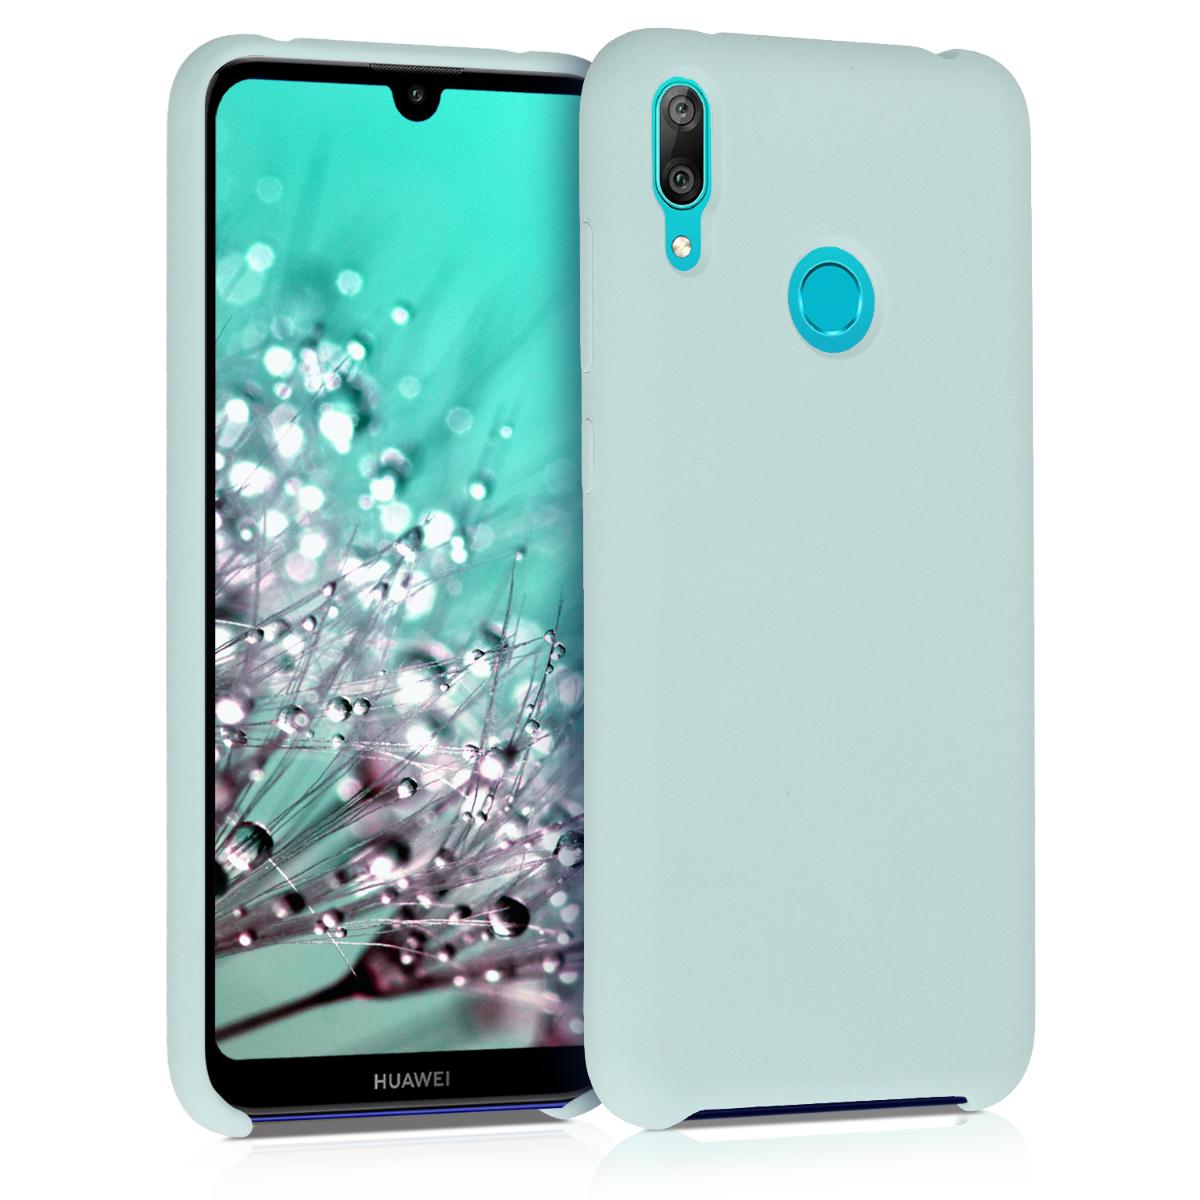 KW Θήκη Σιλικόνης Huawei Y7 / Y7 Prime 2019 - Soft Flexible Rubber - Mint (50686.71)